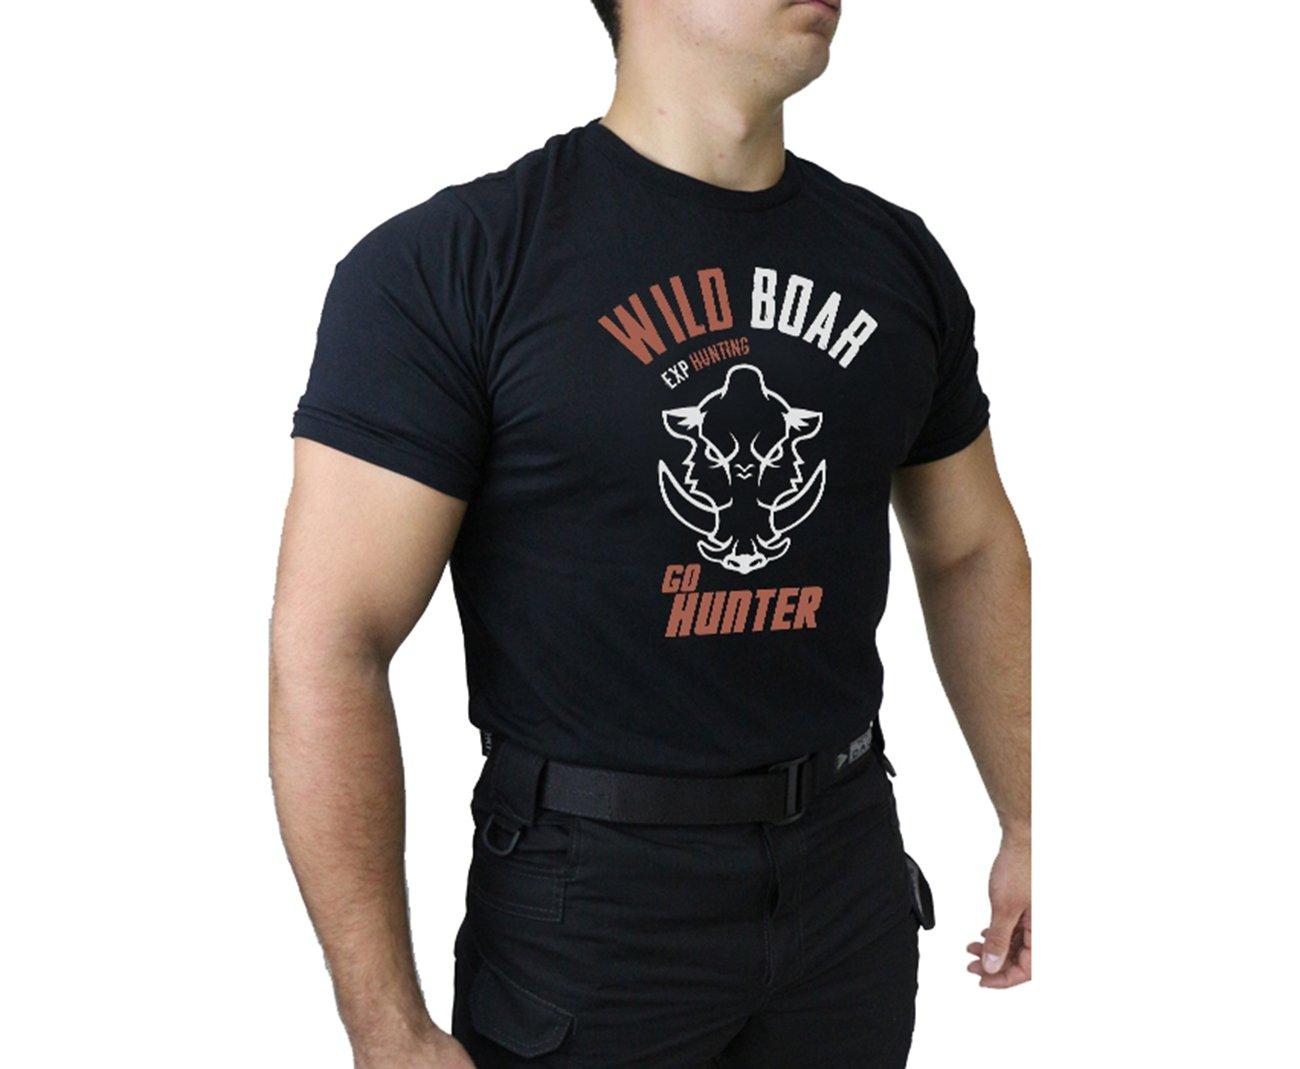 Camiseta Temática Hunting - 002 - Preto - Dacs